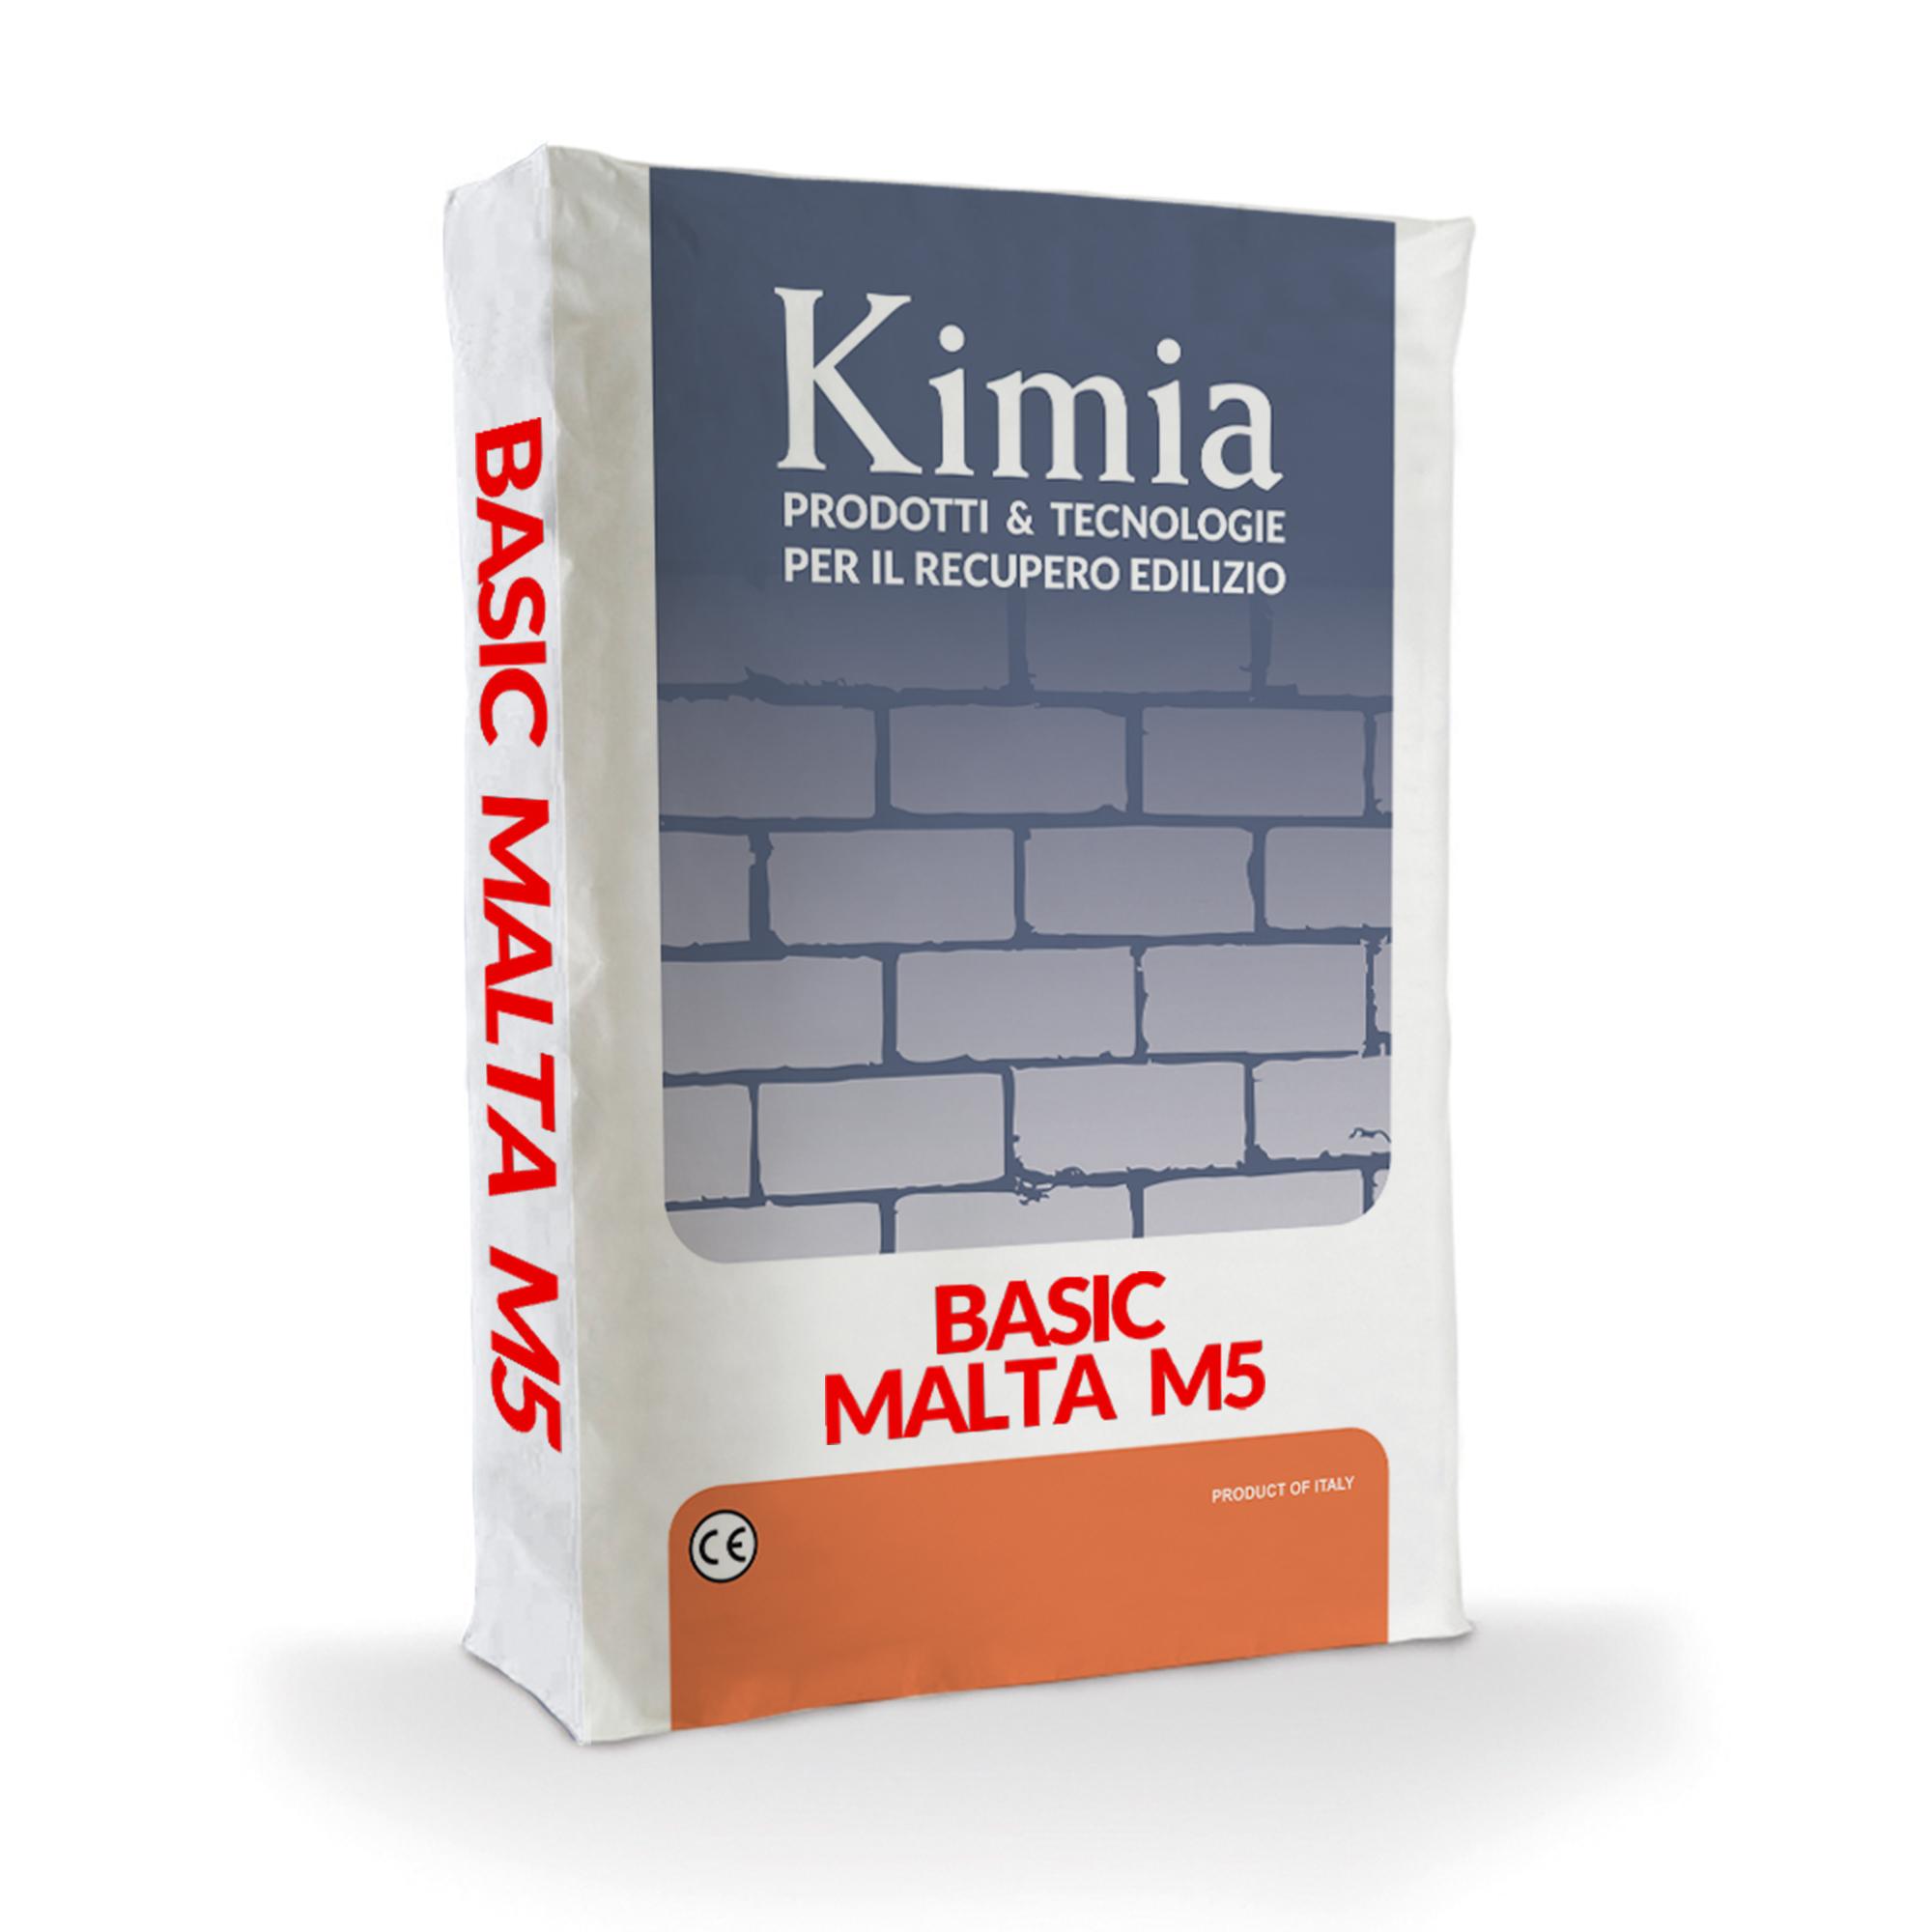 Basic MALTA M5